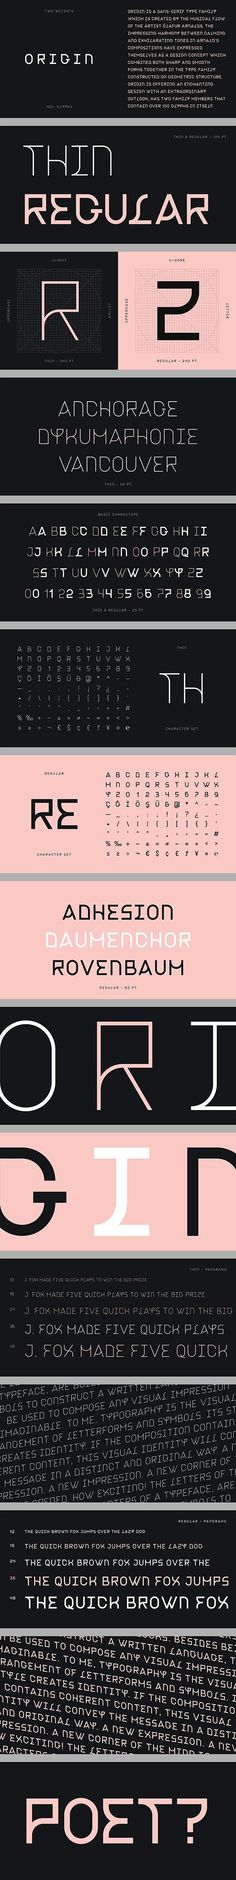 Origin Type Family - GraphicRiver #font #typography #alphabet #graphicdesign #BestDesignResources